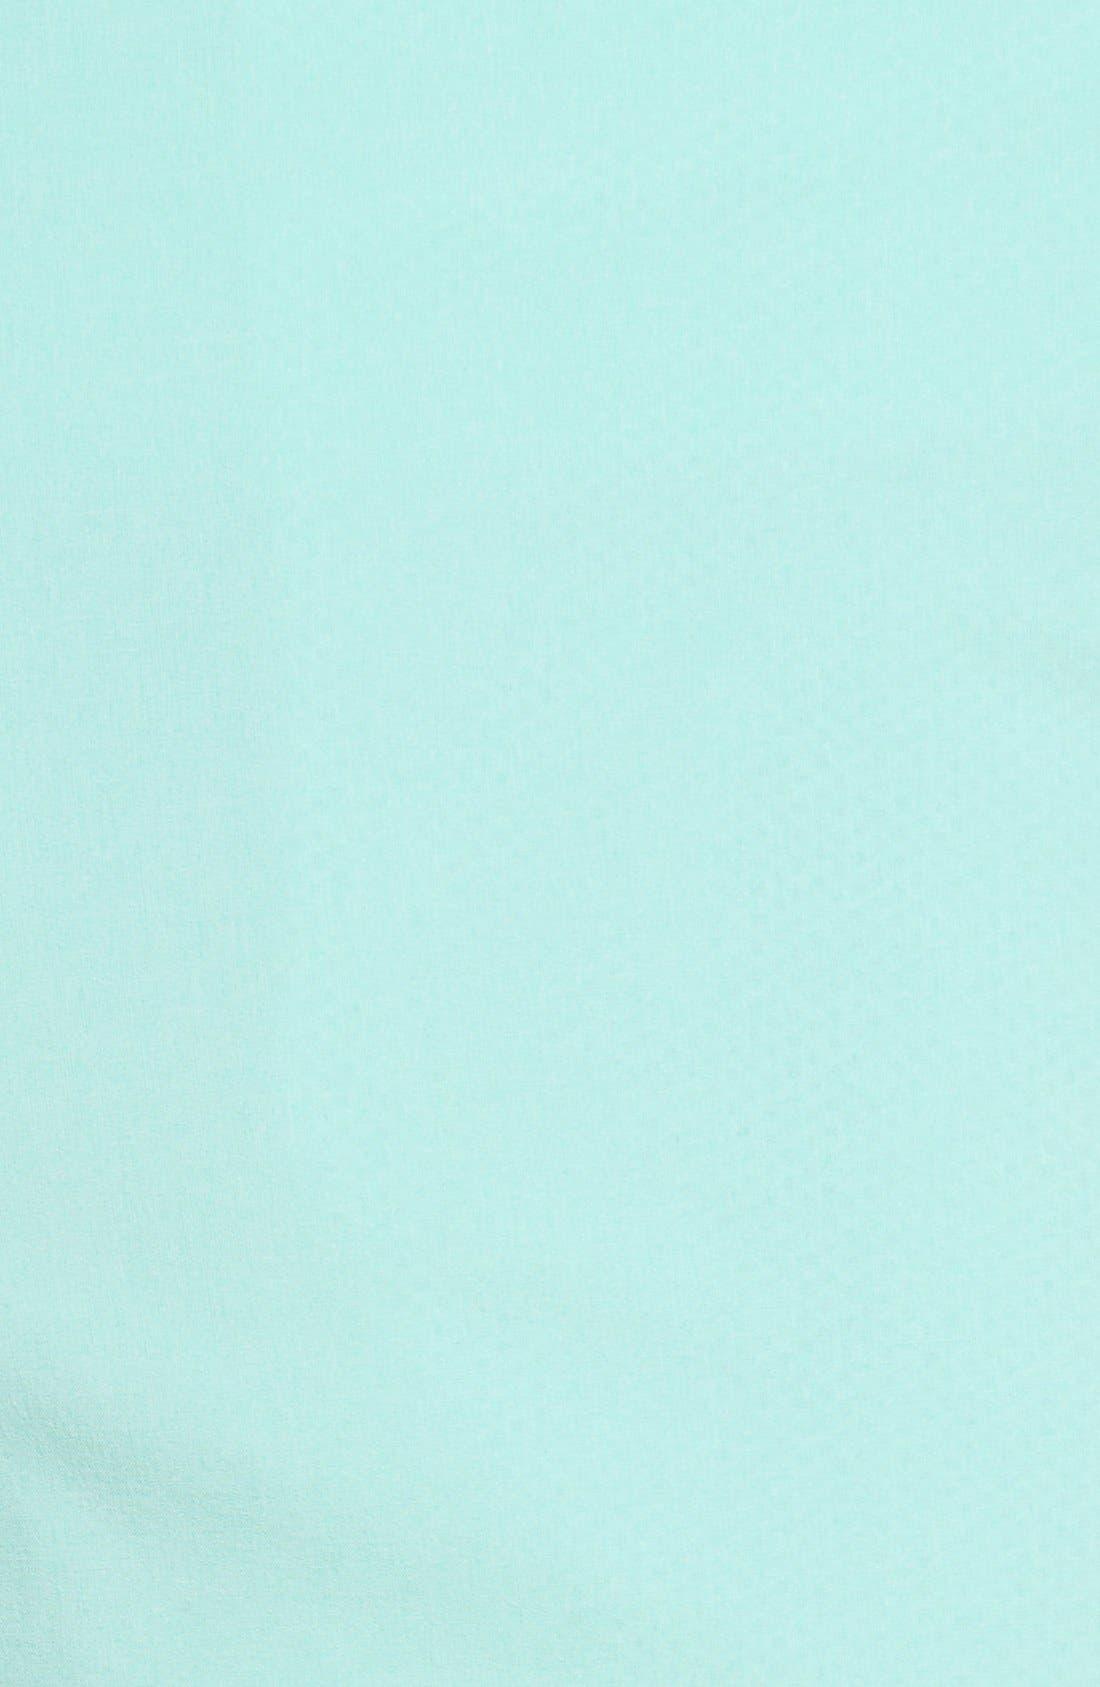 8 Inch Performance Breaker Shorts,                             Alternate thumbnail 65, color,